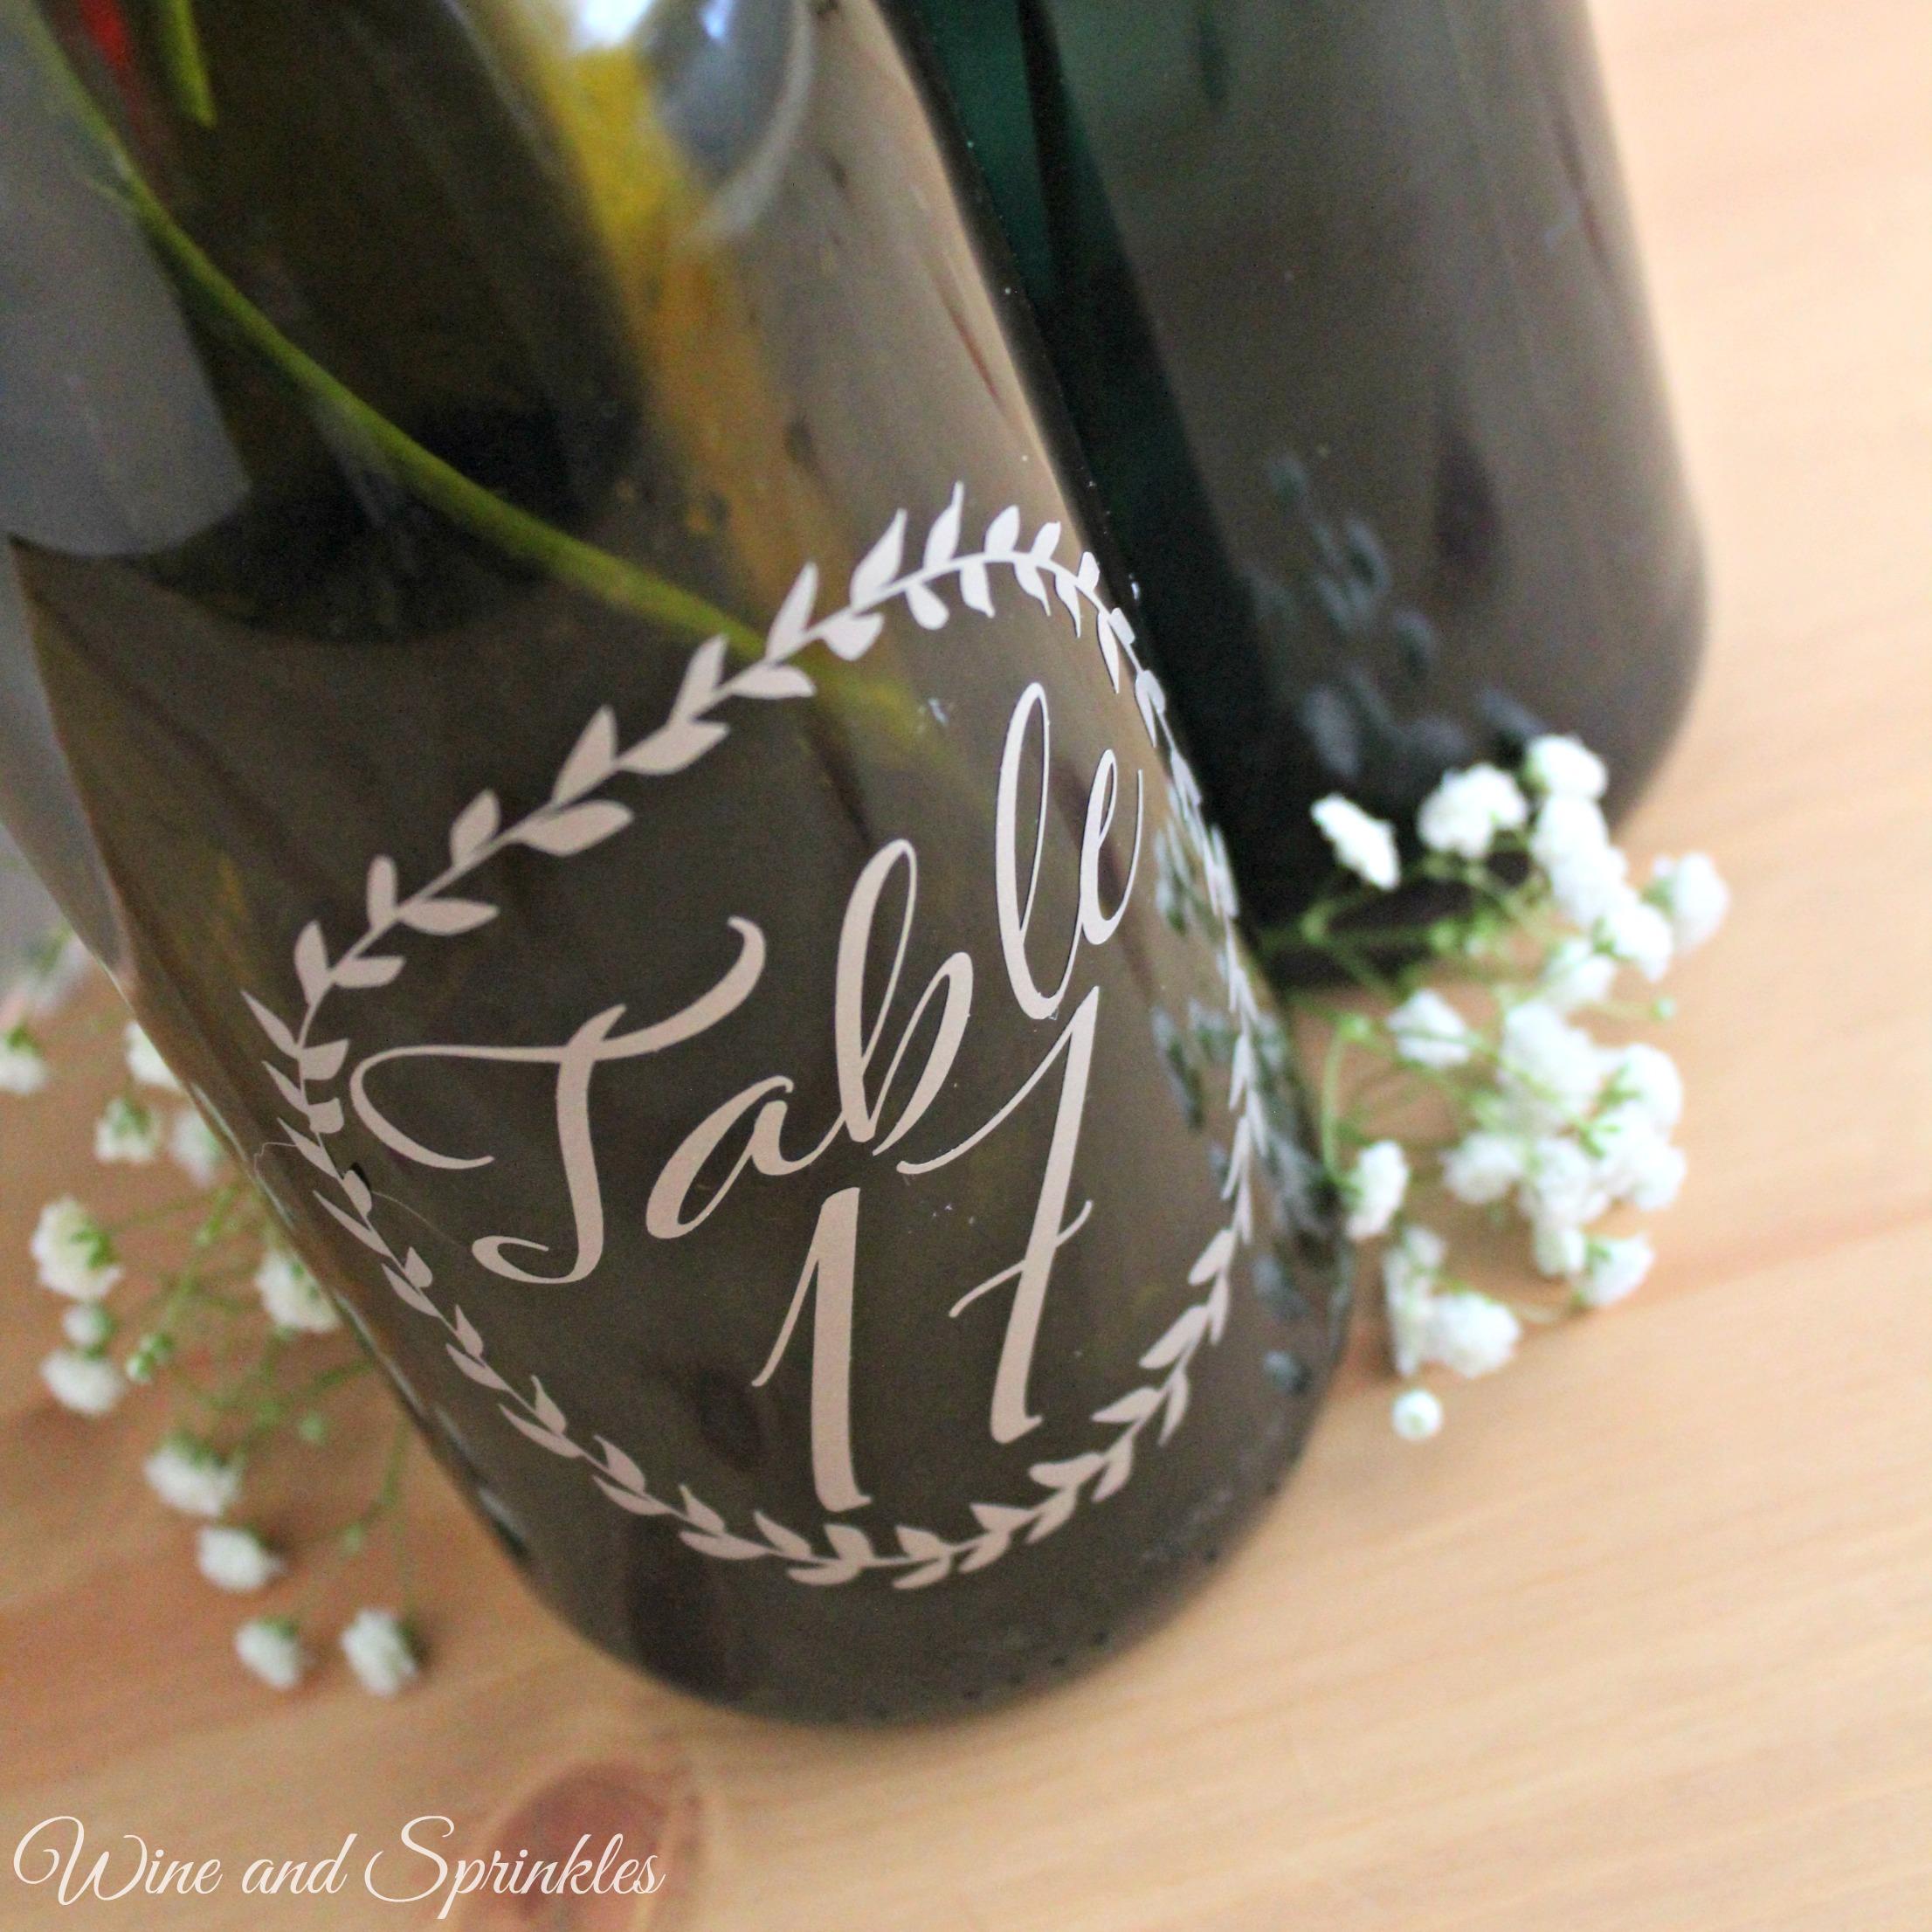 DIY Wreath Wine Bottle Table Numbers #diywedding #cricutprojects #tablenumbers #winebottlecrafts